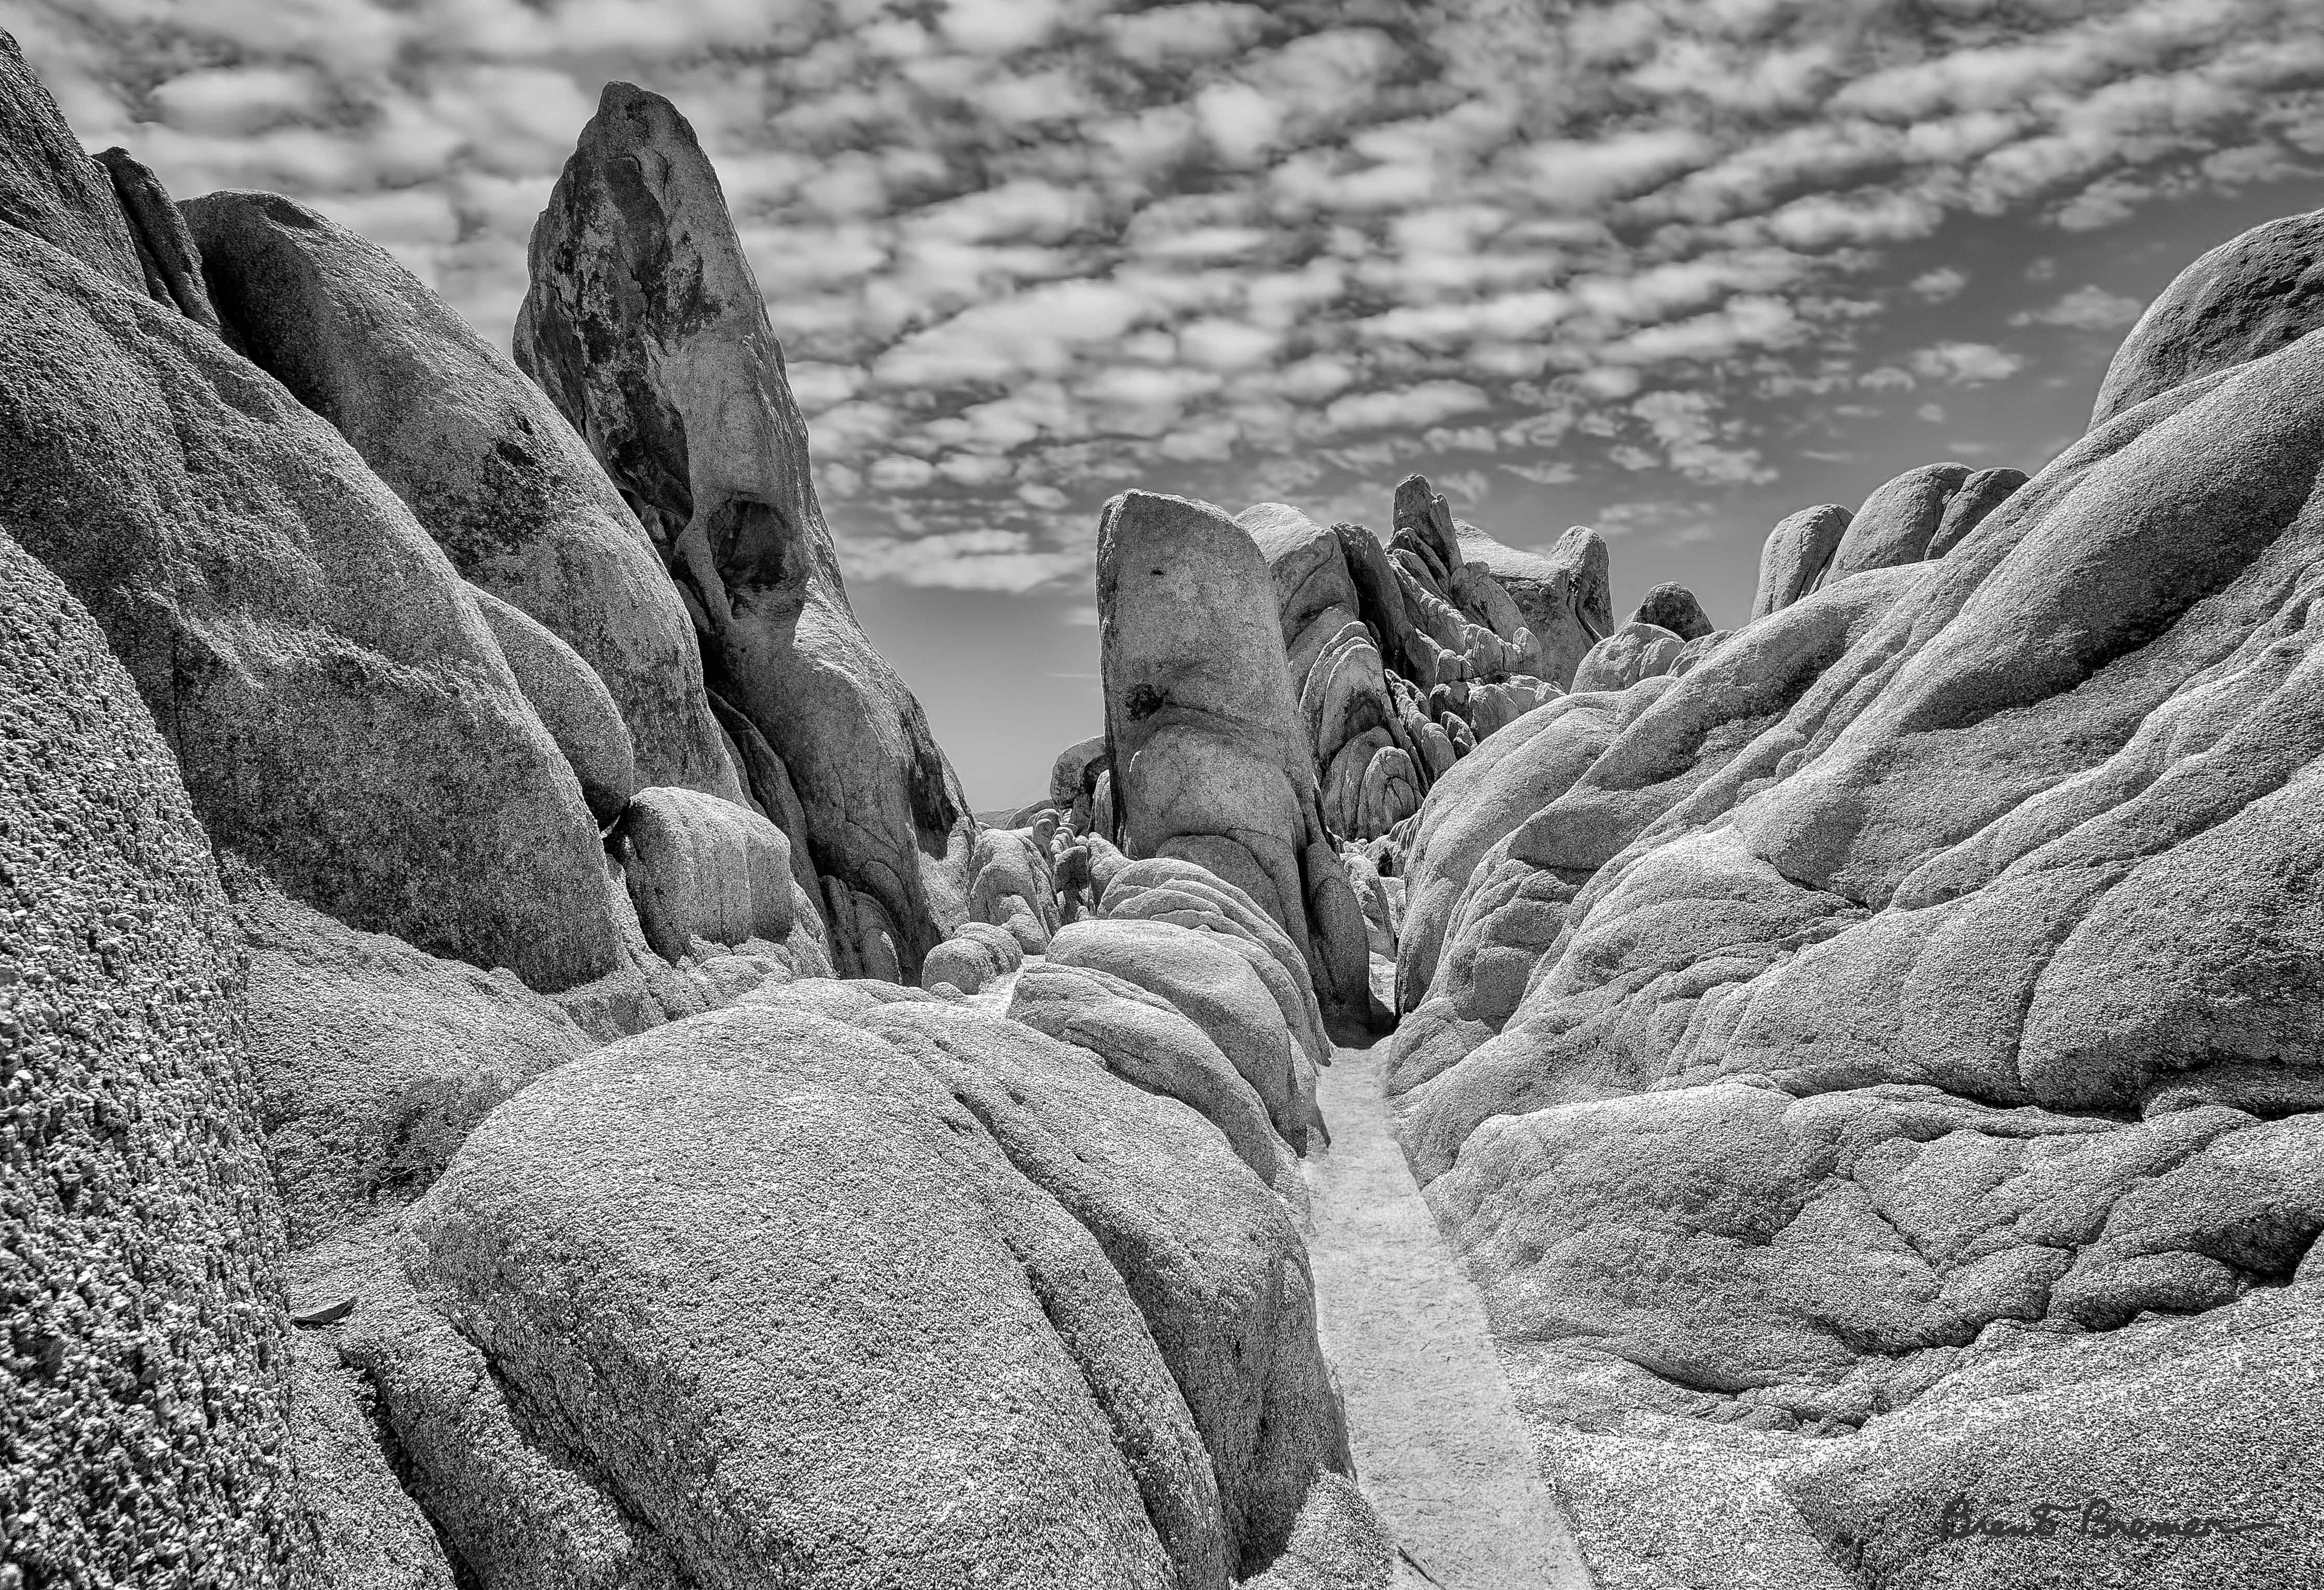 Joshua Tree Plutonic Passageway- Brent Bremer